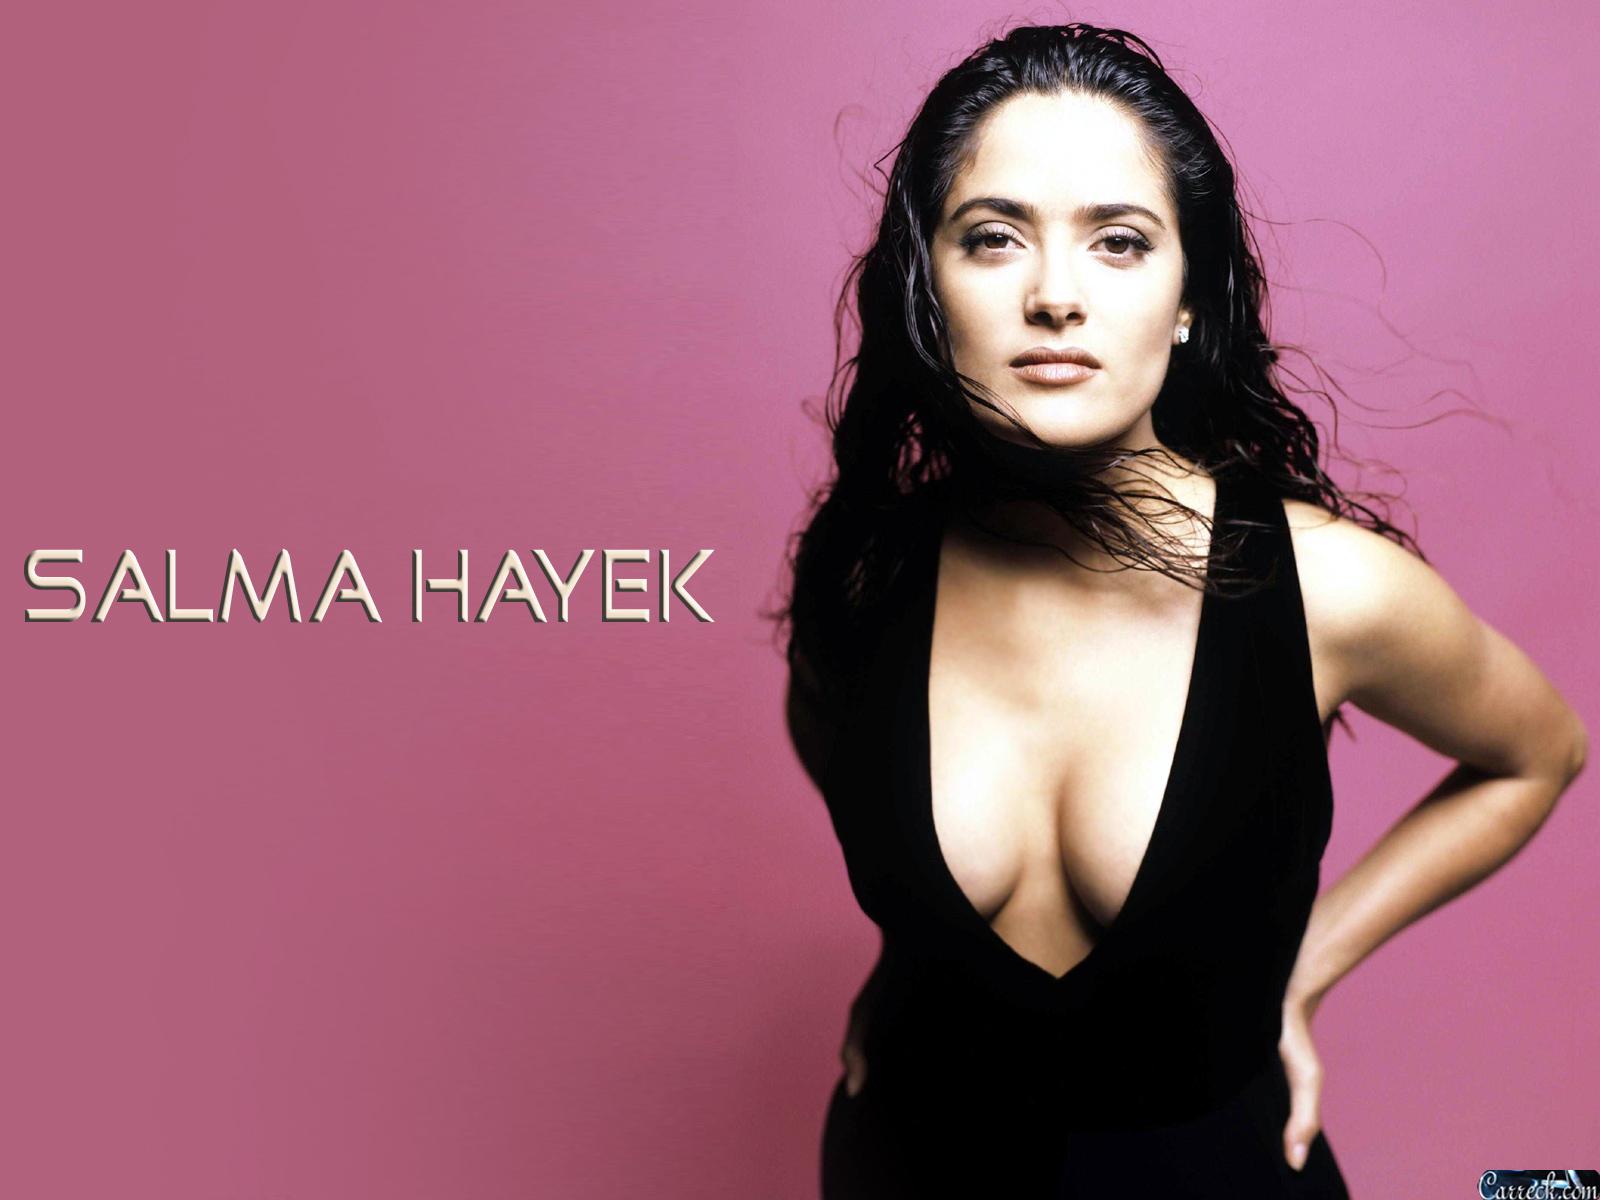 Salma Hayek - Salma Hayek Wallpaper (20896732) - Fanpop Salma Hayek